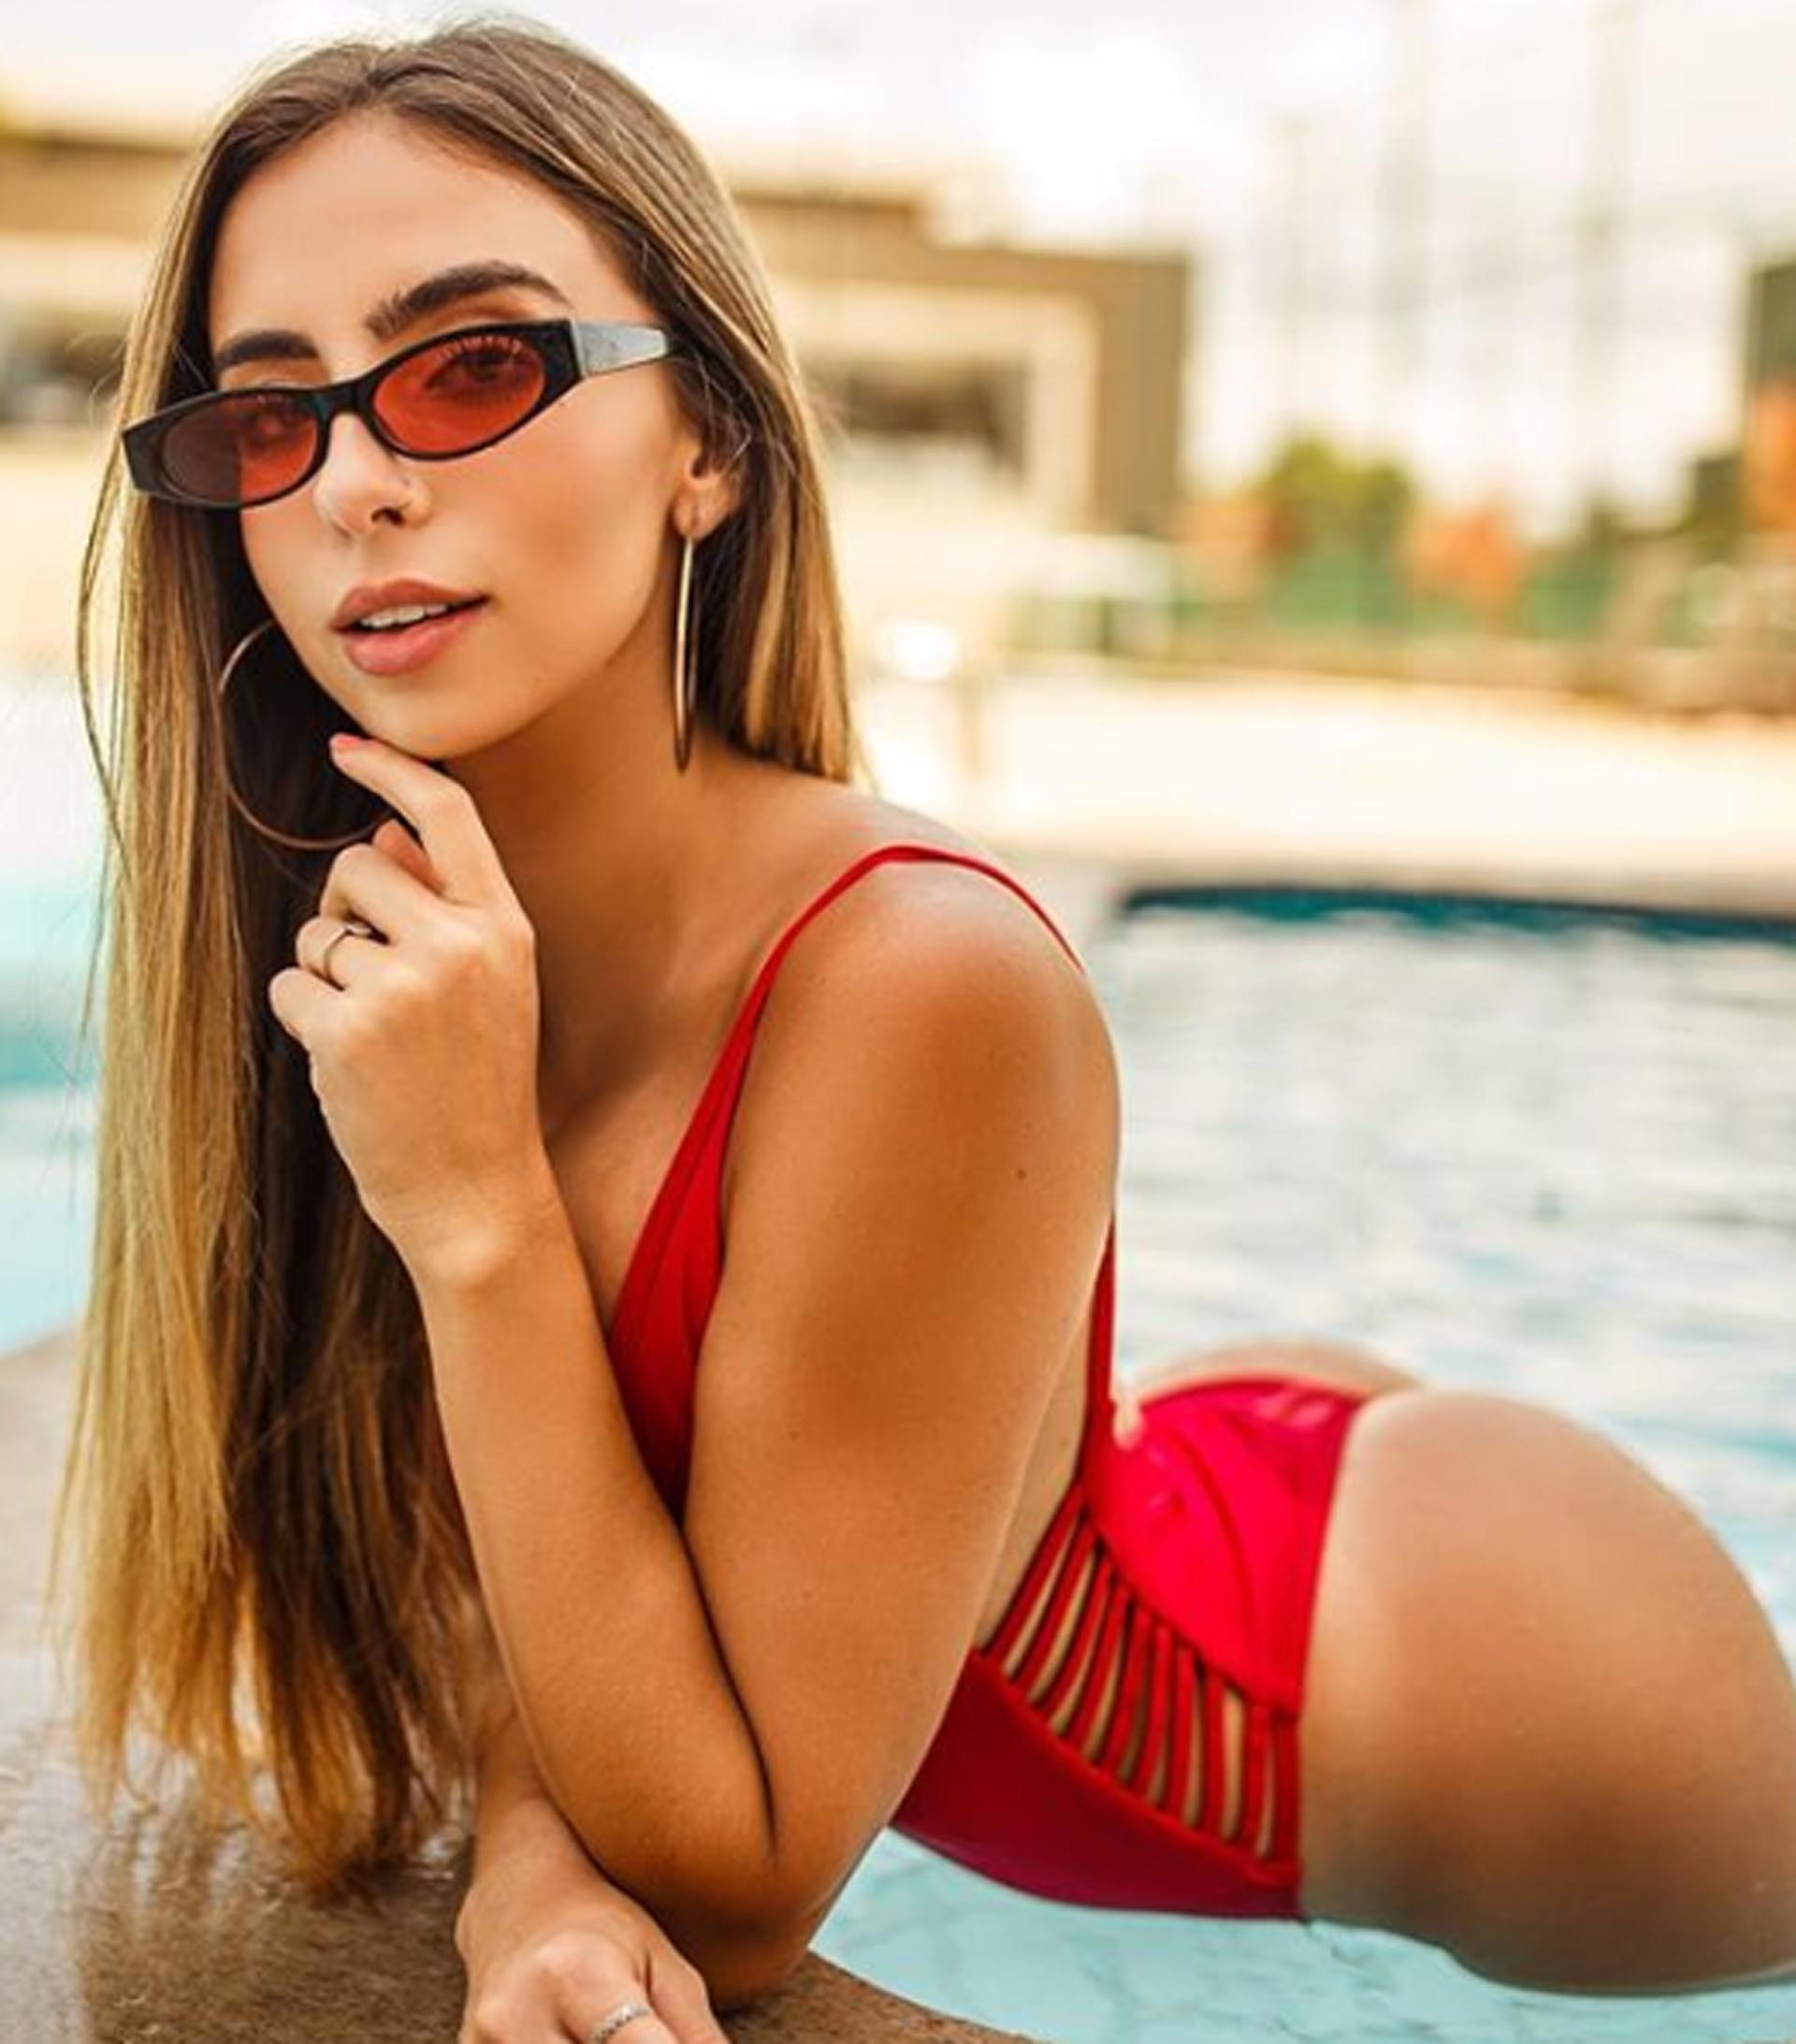 Young Bruna Rangel Lima naked (22 photos), Tits, Bikini, Boobs, braless 2018